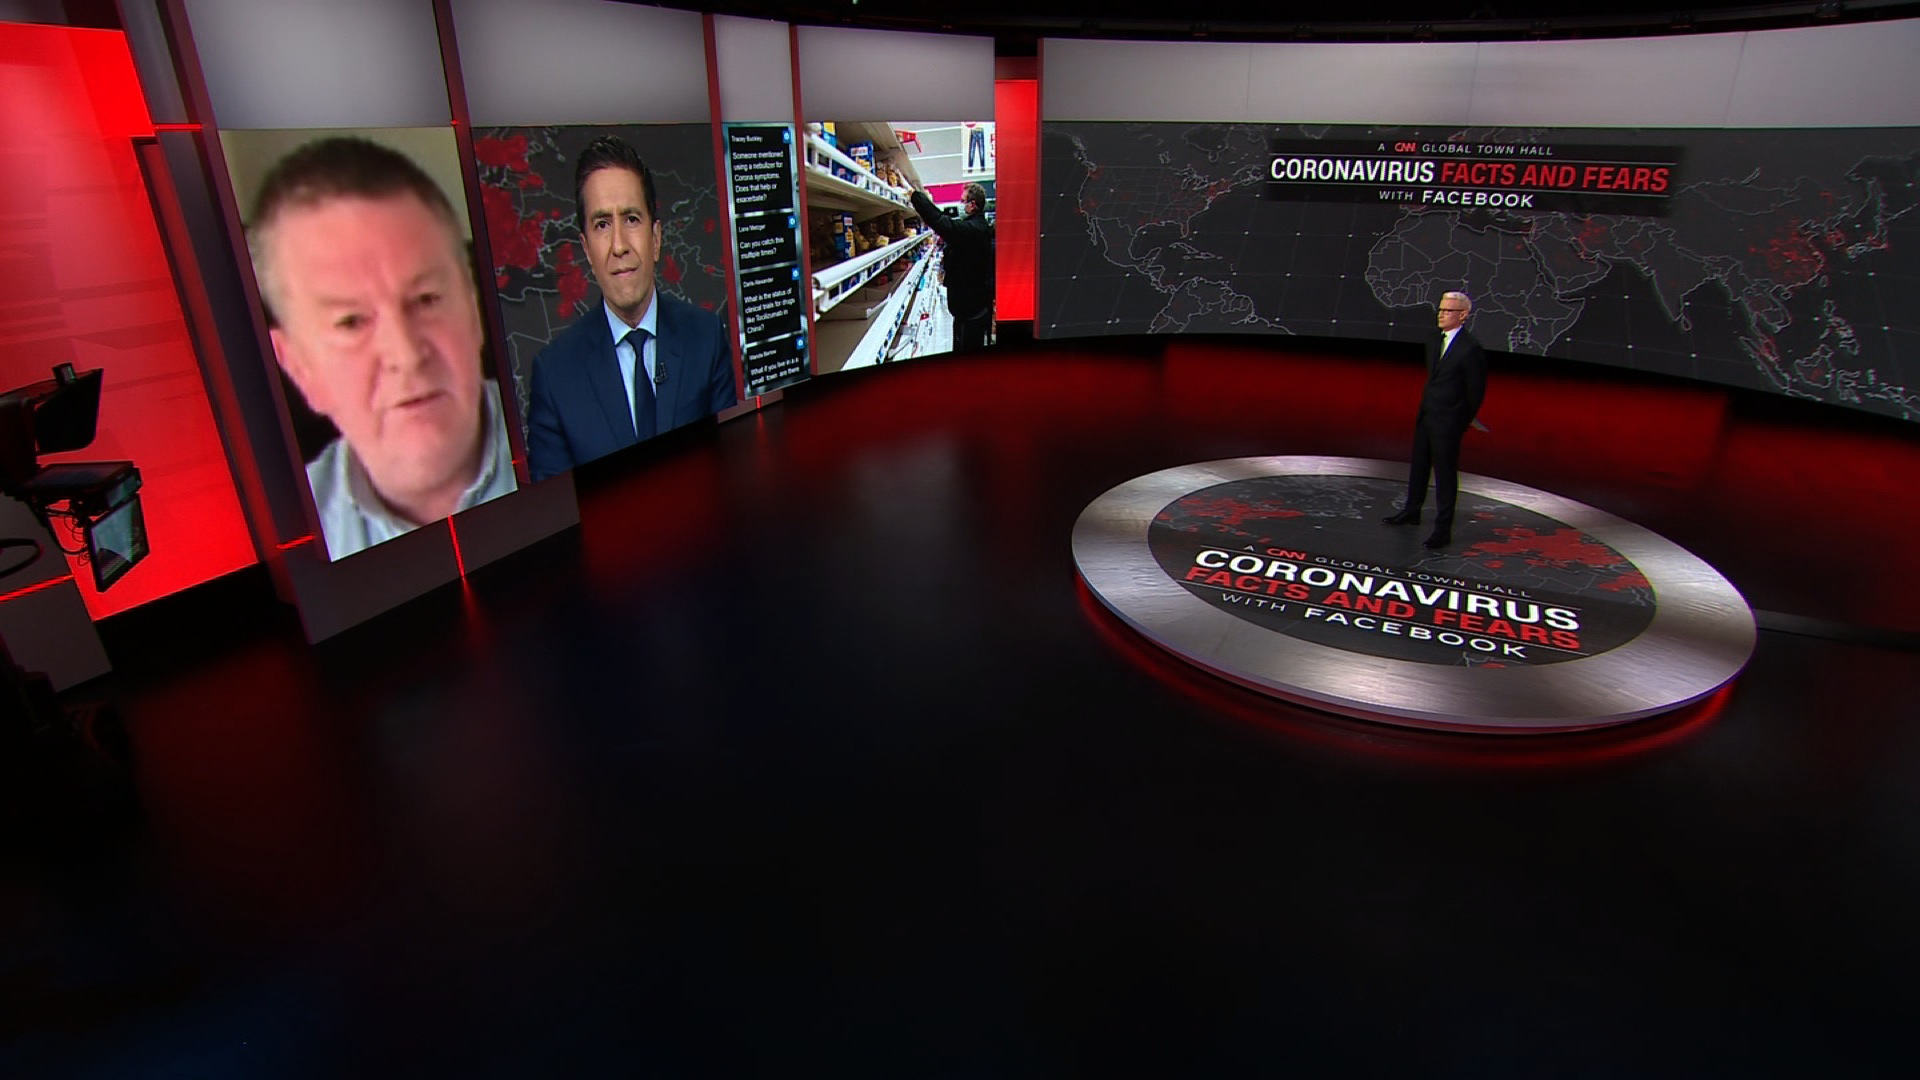 March 19 Coronavirus News Cnn